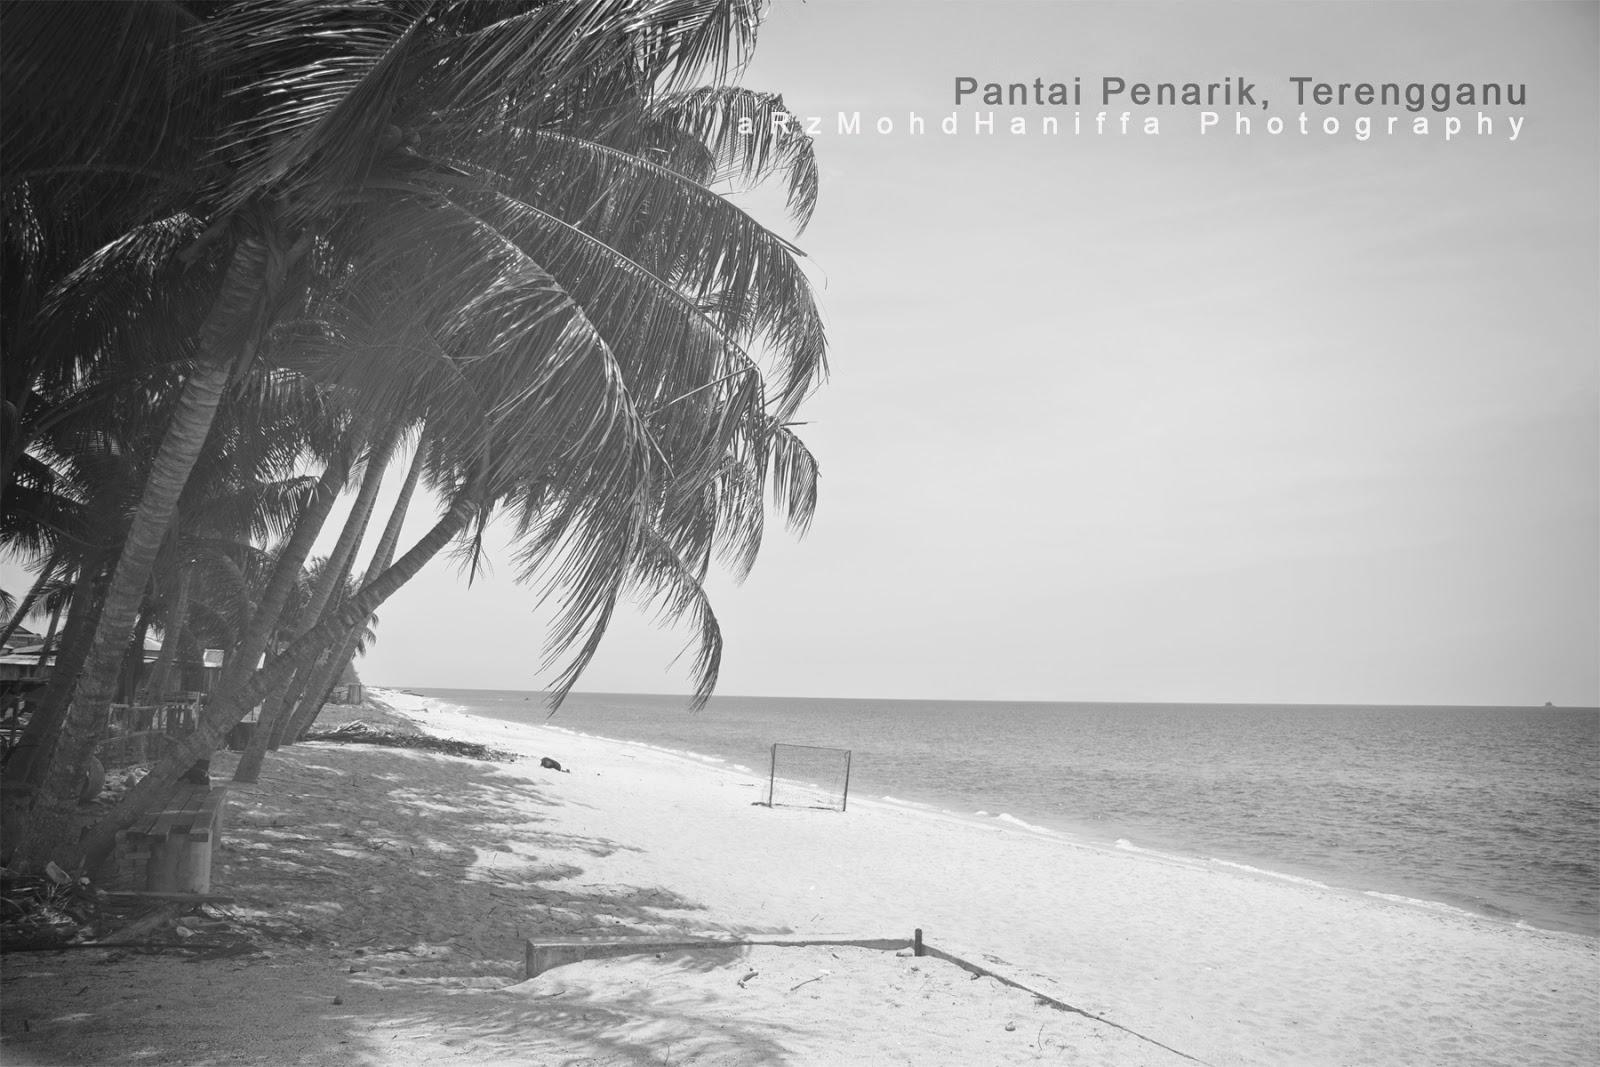 Pantai, Penarik, Terengganu, arzmohdhaniffa, gambar cantik